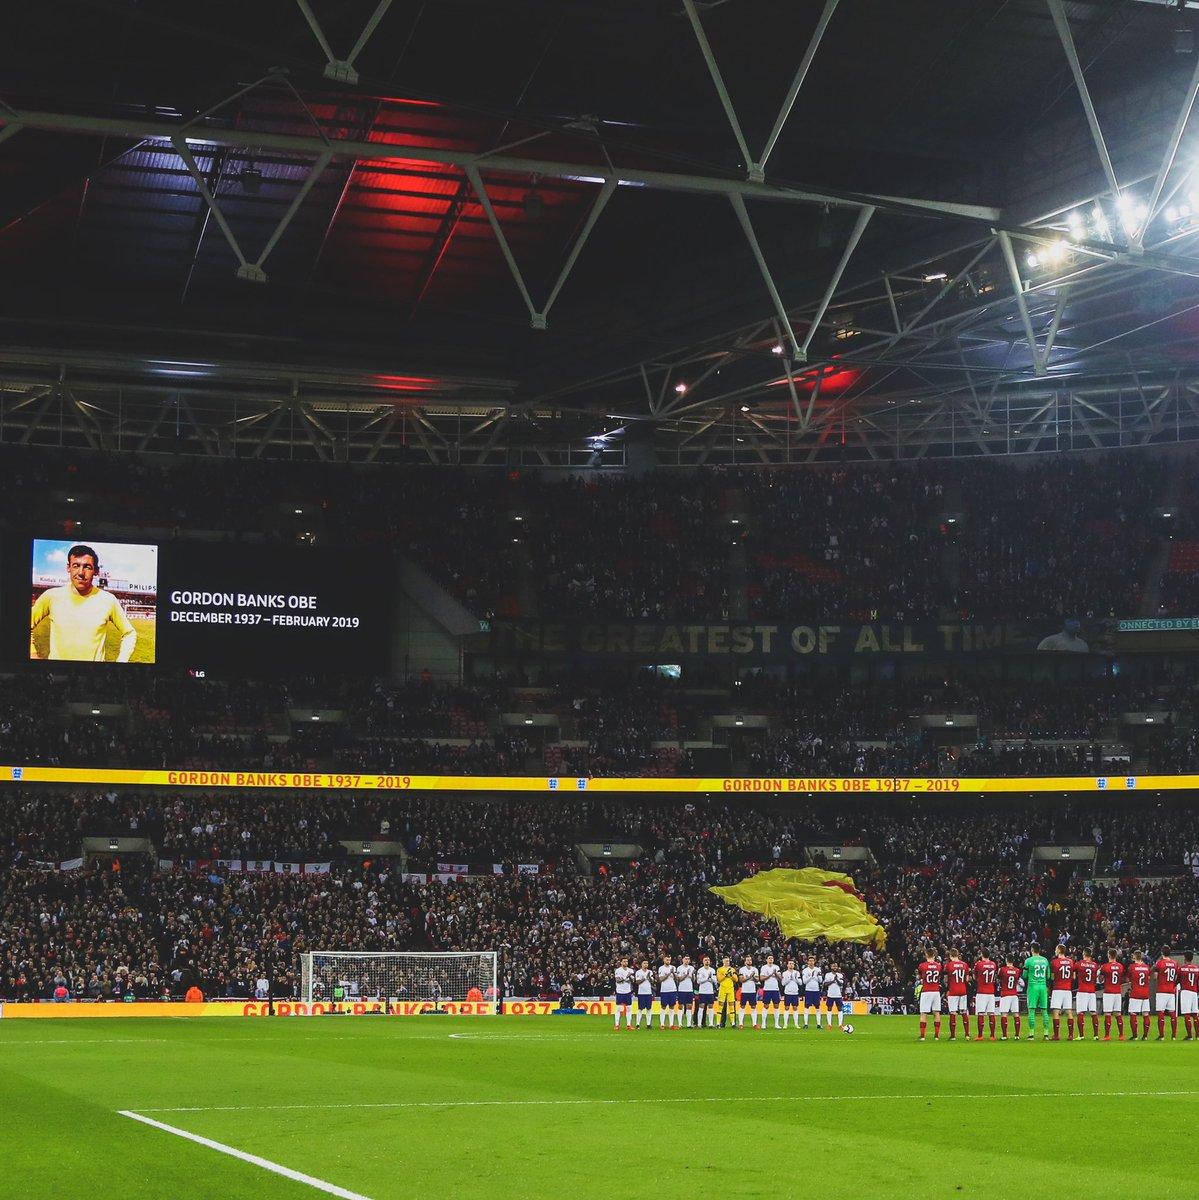 🙏 Remembrances paid by @England and @CeskarePre_Cz at @WembleyStadium:   🏴 Gordon Banks OBE  🇳🇿 Christchurch Attack  👊 Respect.